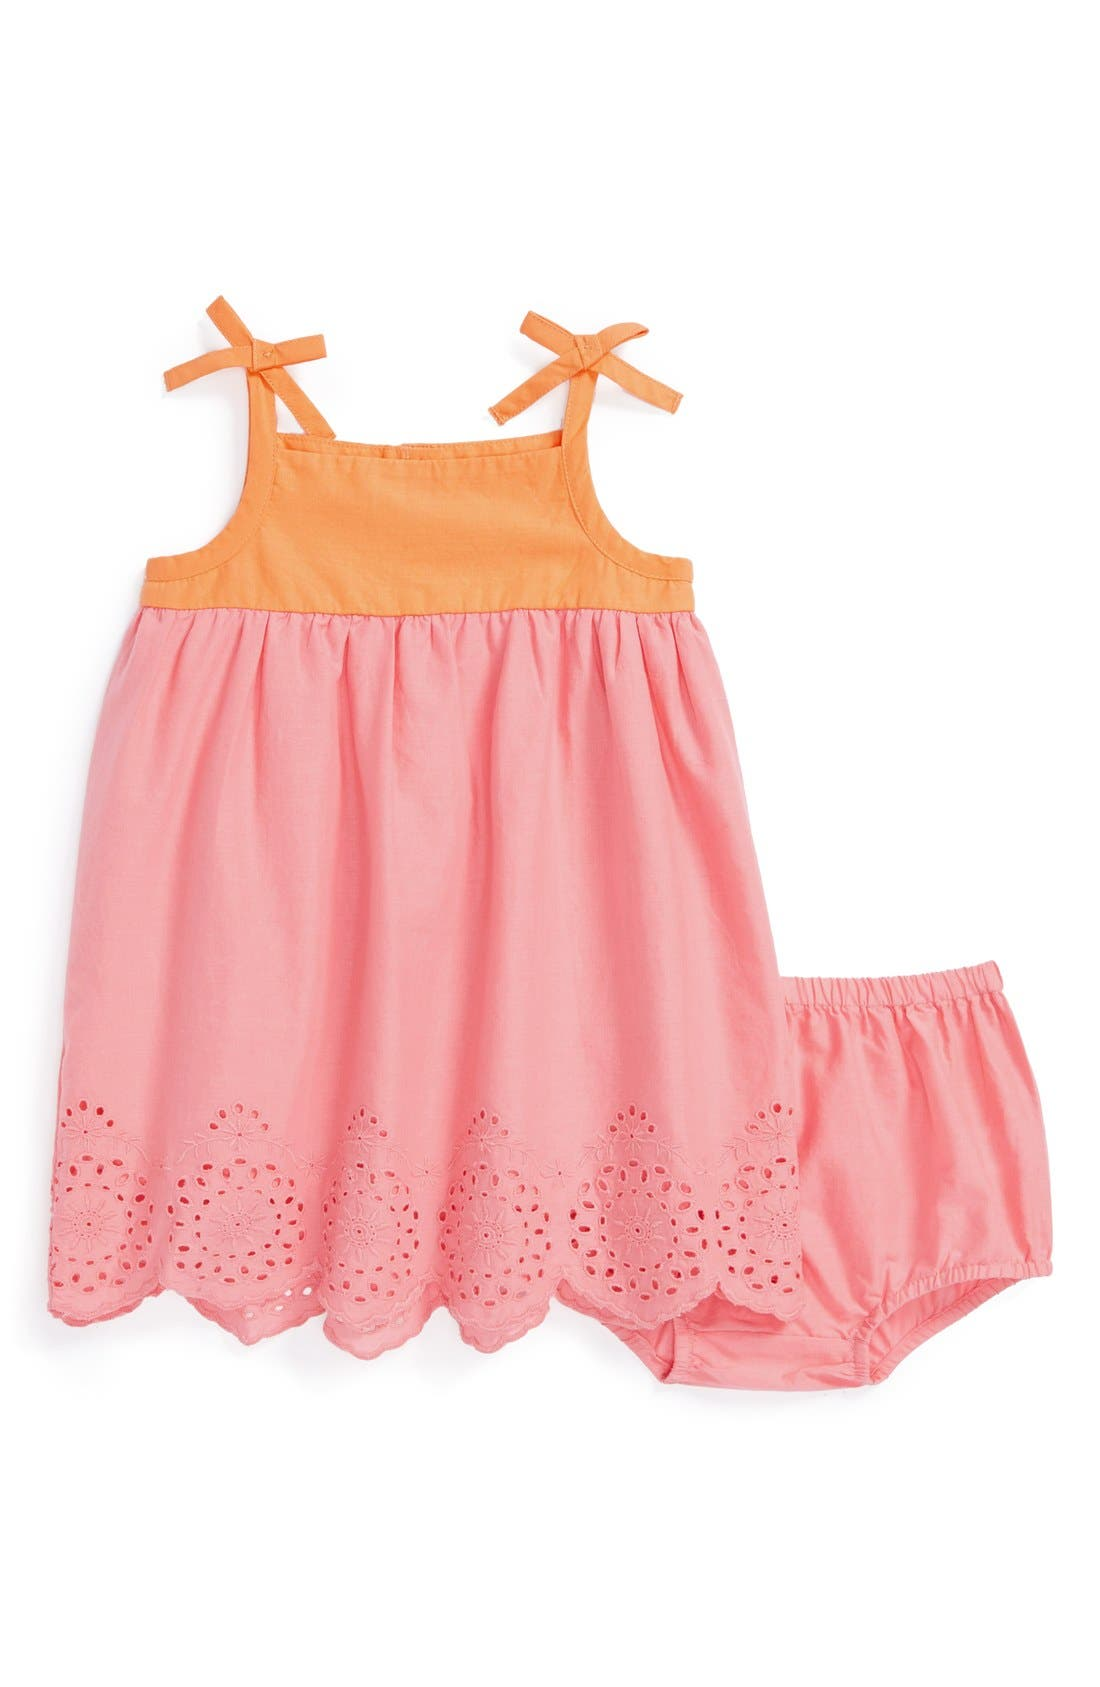 Alternate Image 1 Selected - Tucker + Tate Sleeveless Sundress & Bloomers (Baby Girls)